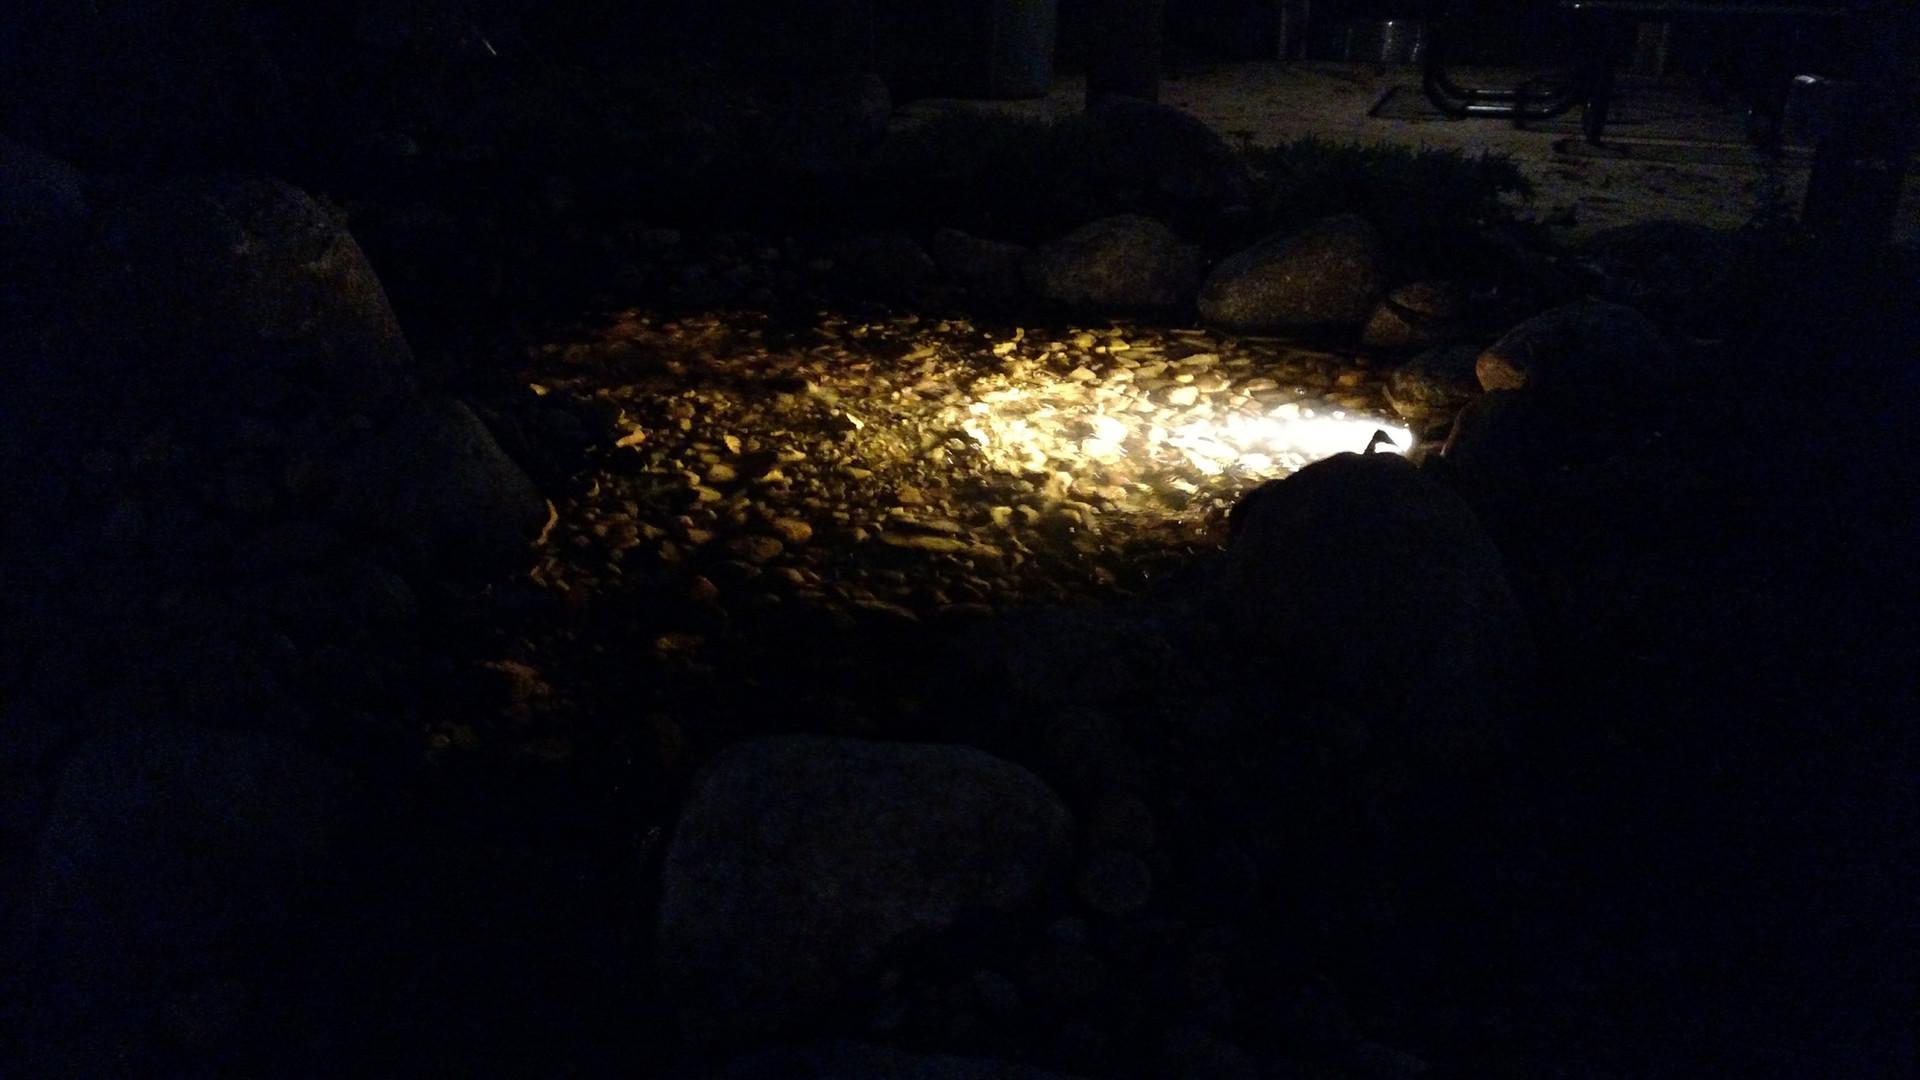 Patio, Lighting, Water Feature & Landscape